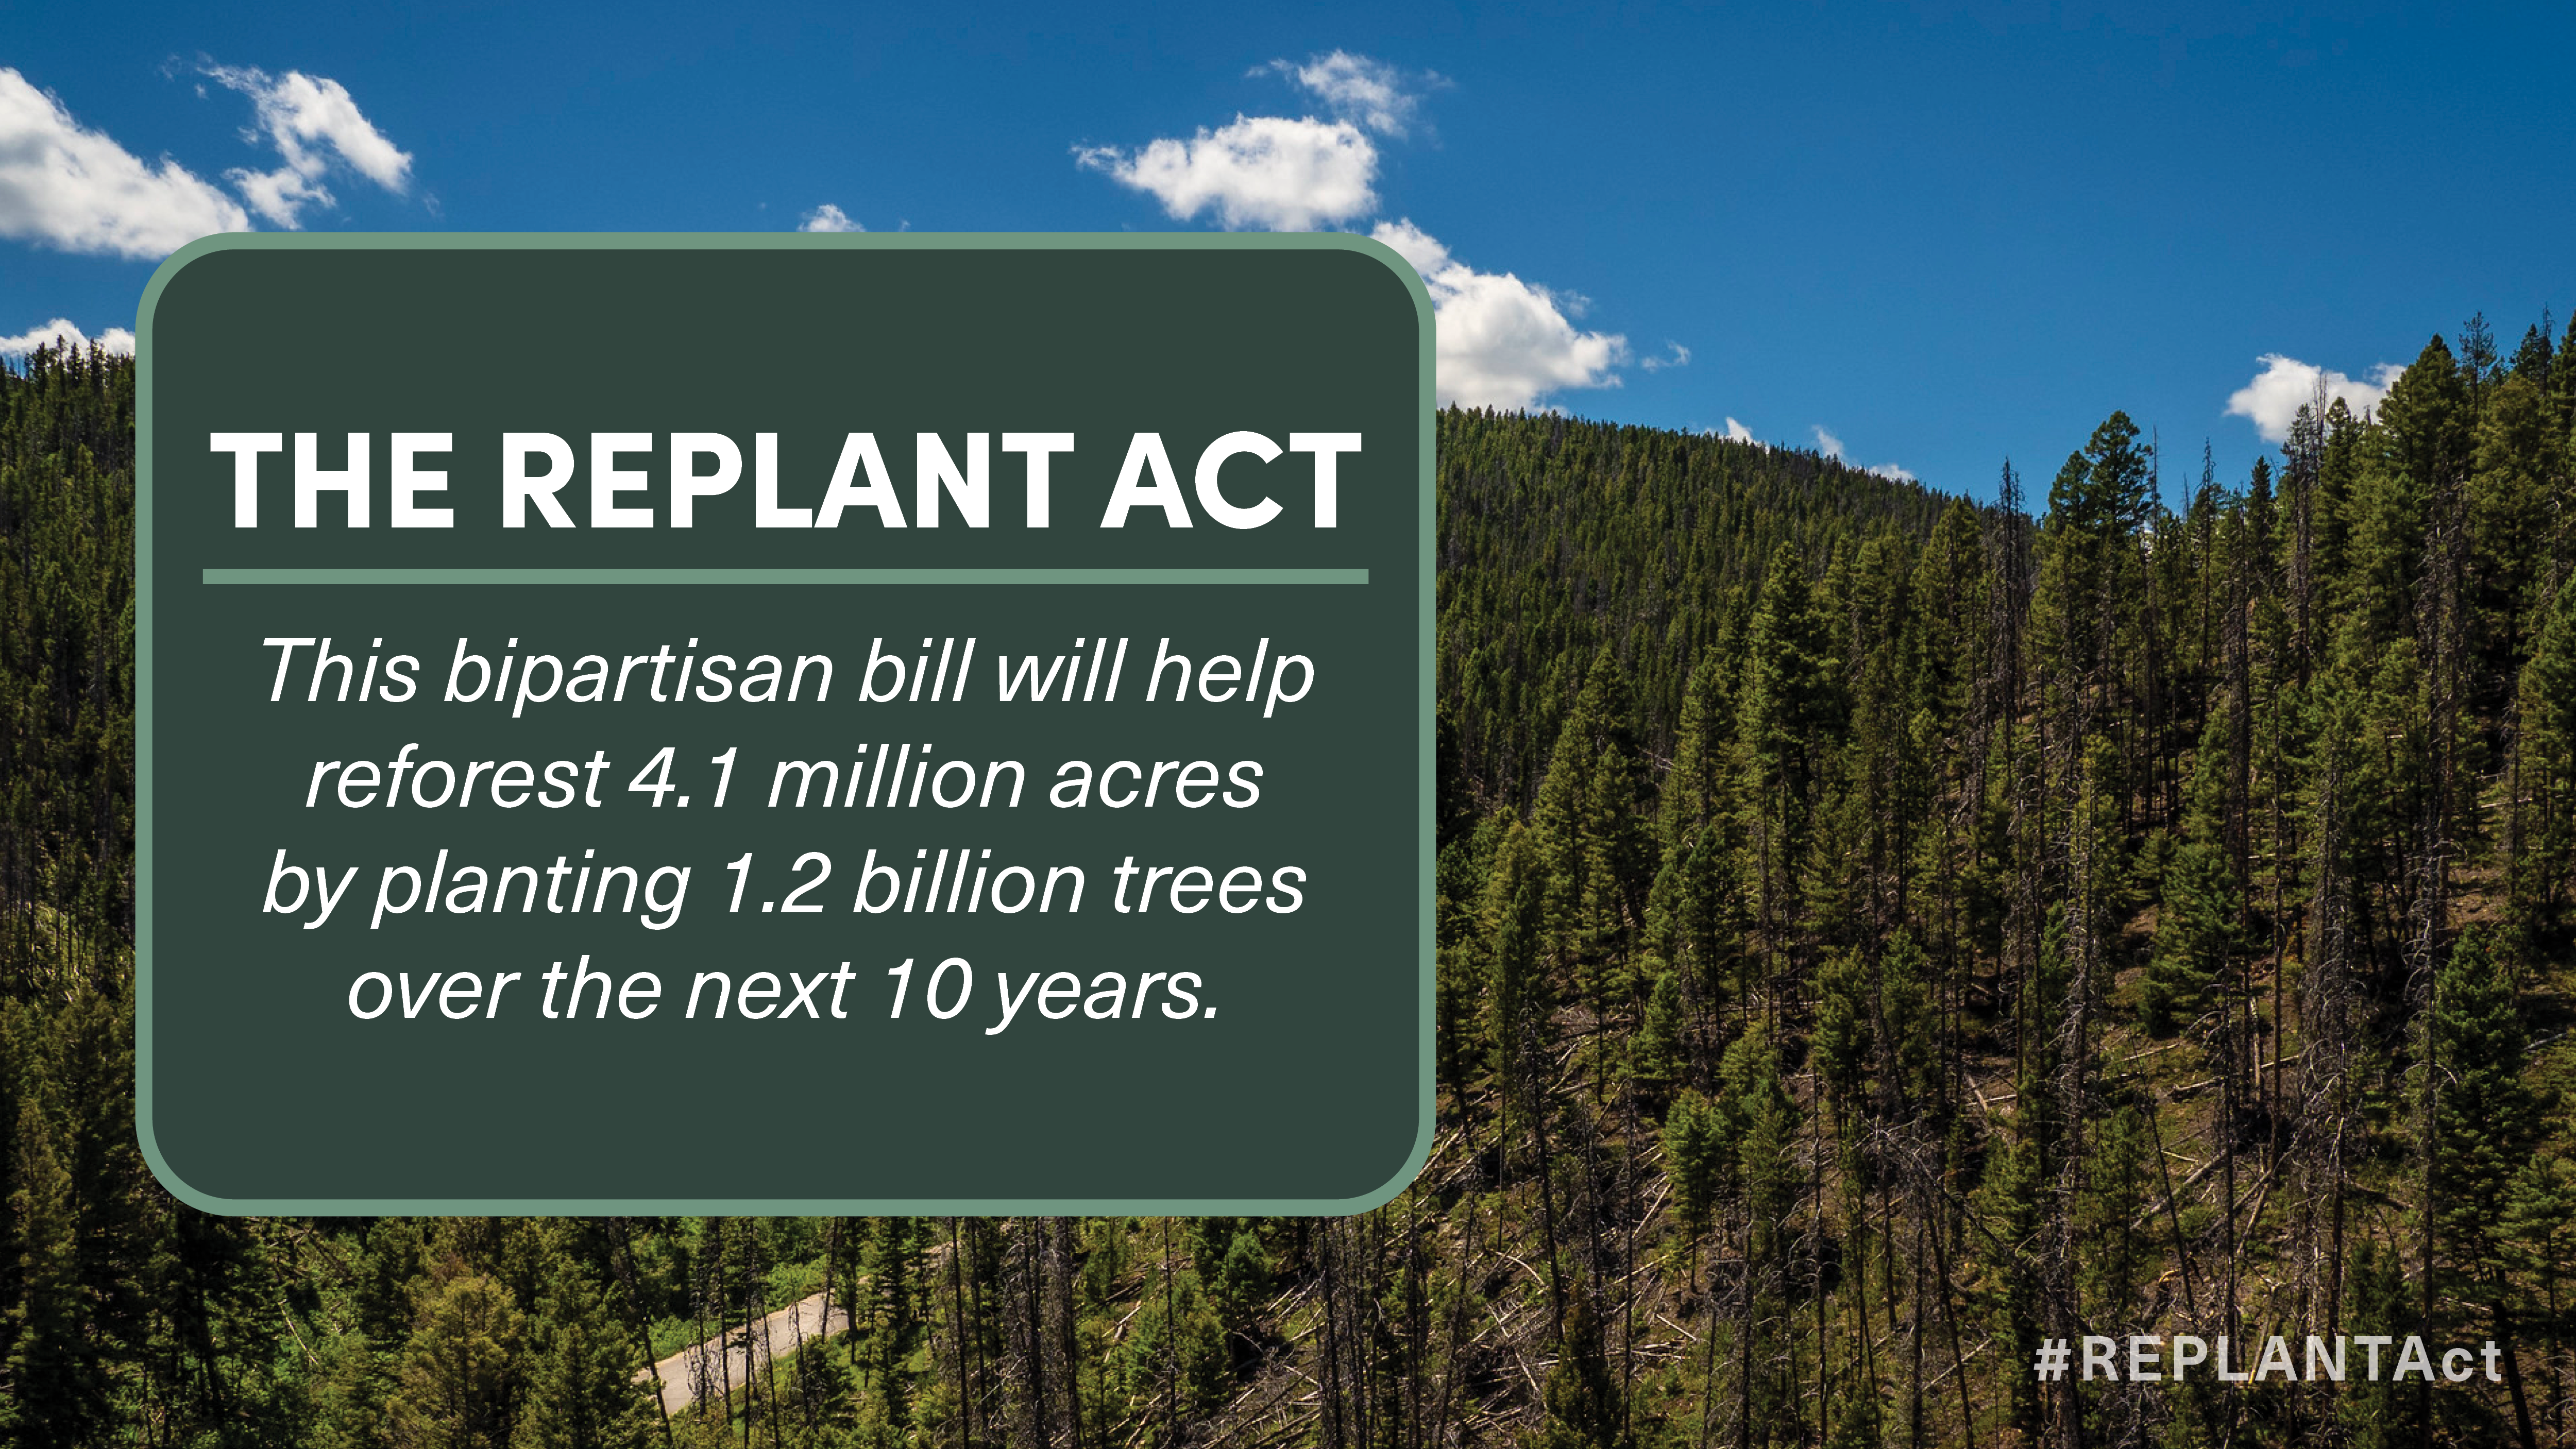 YECA Applauds Introduction of Bipartisan REPLANT Act